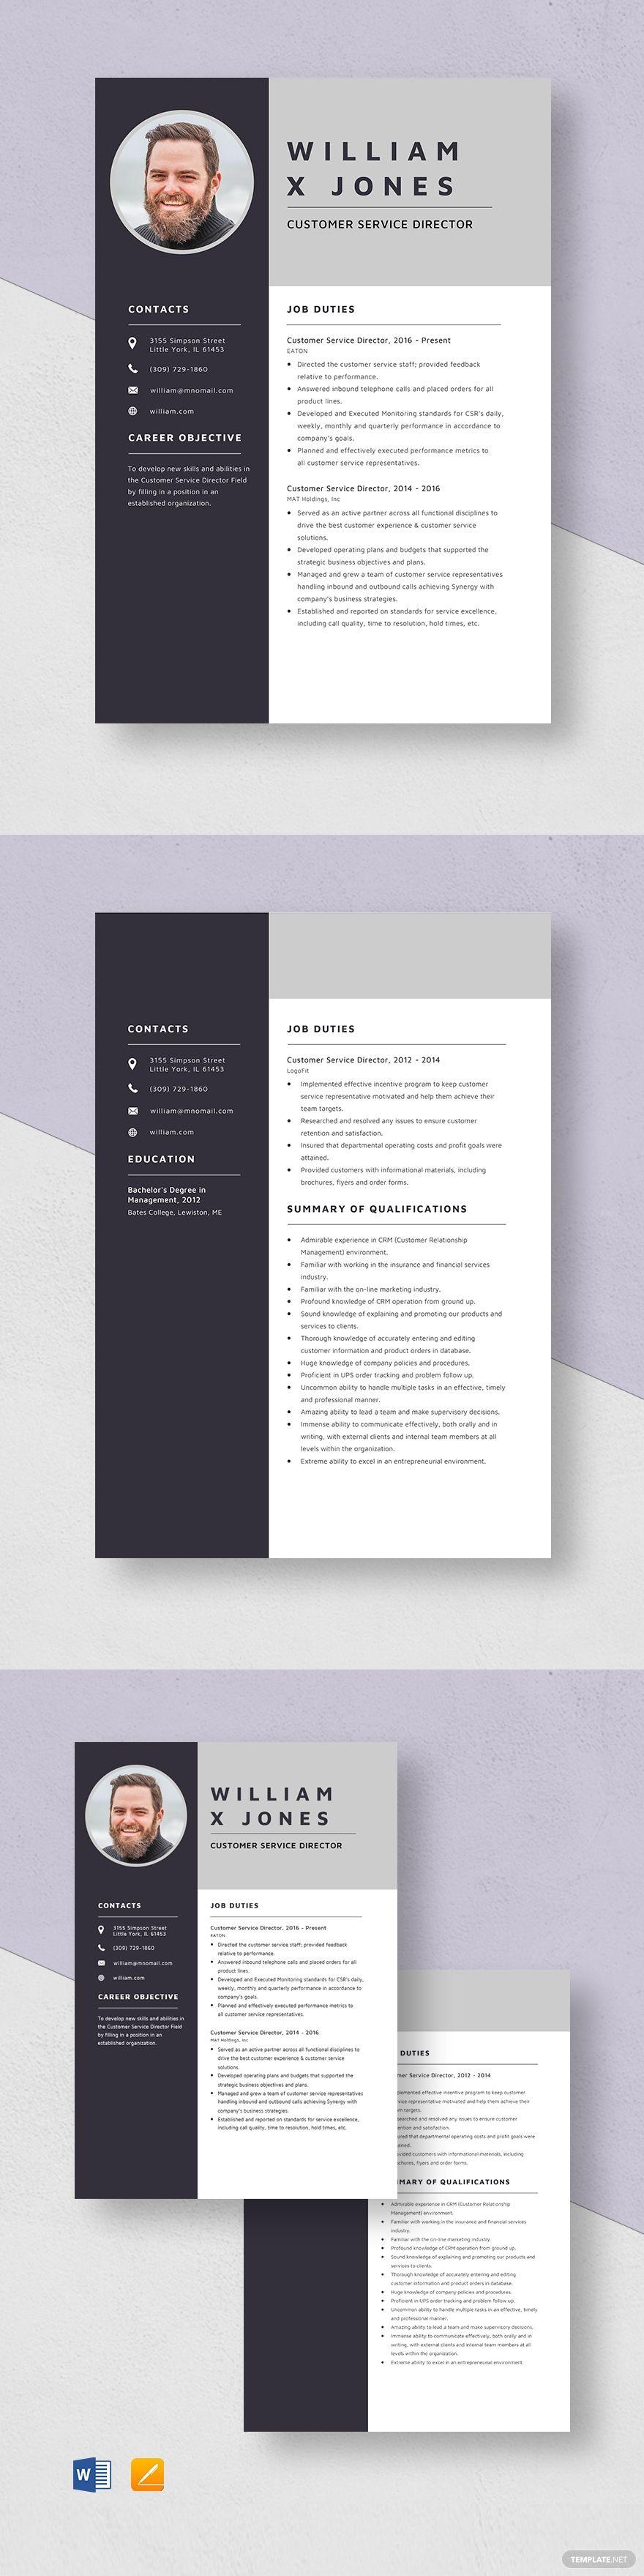 Customer service director resume template in 2020 resume